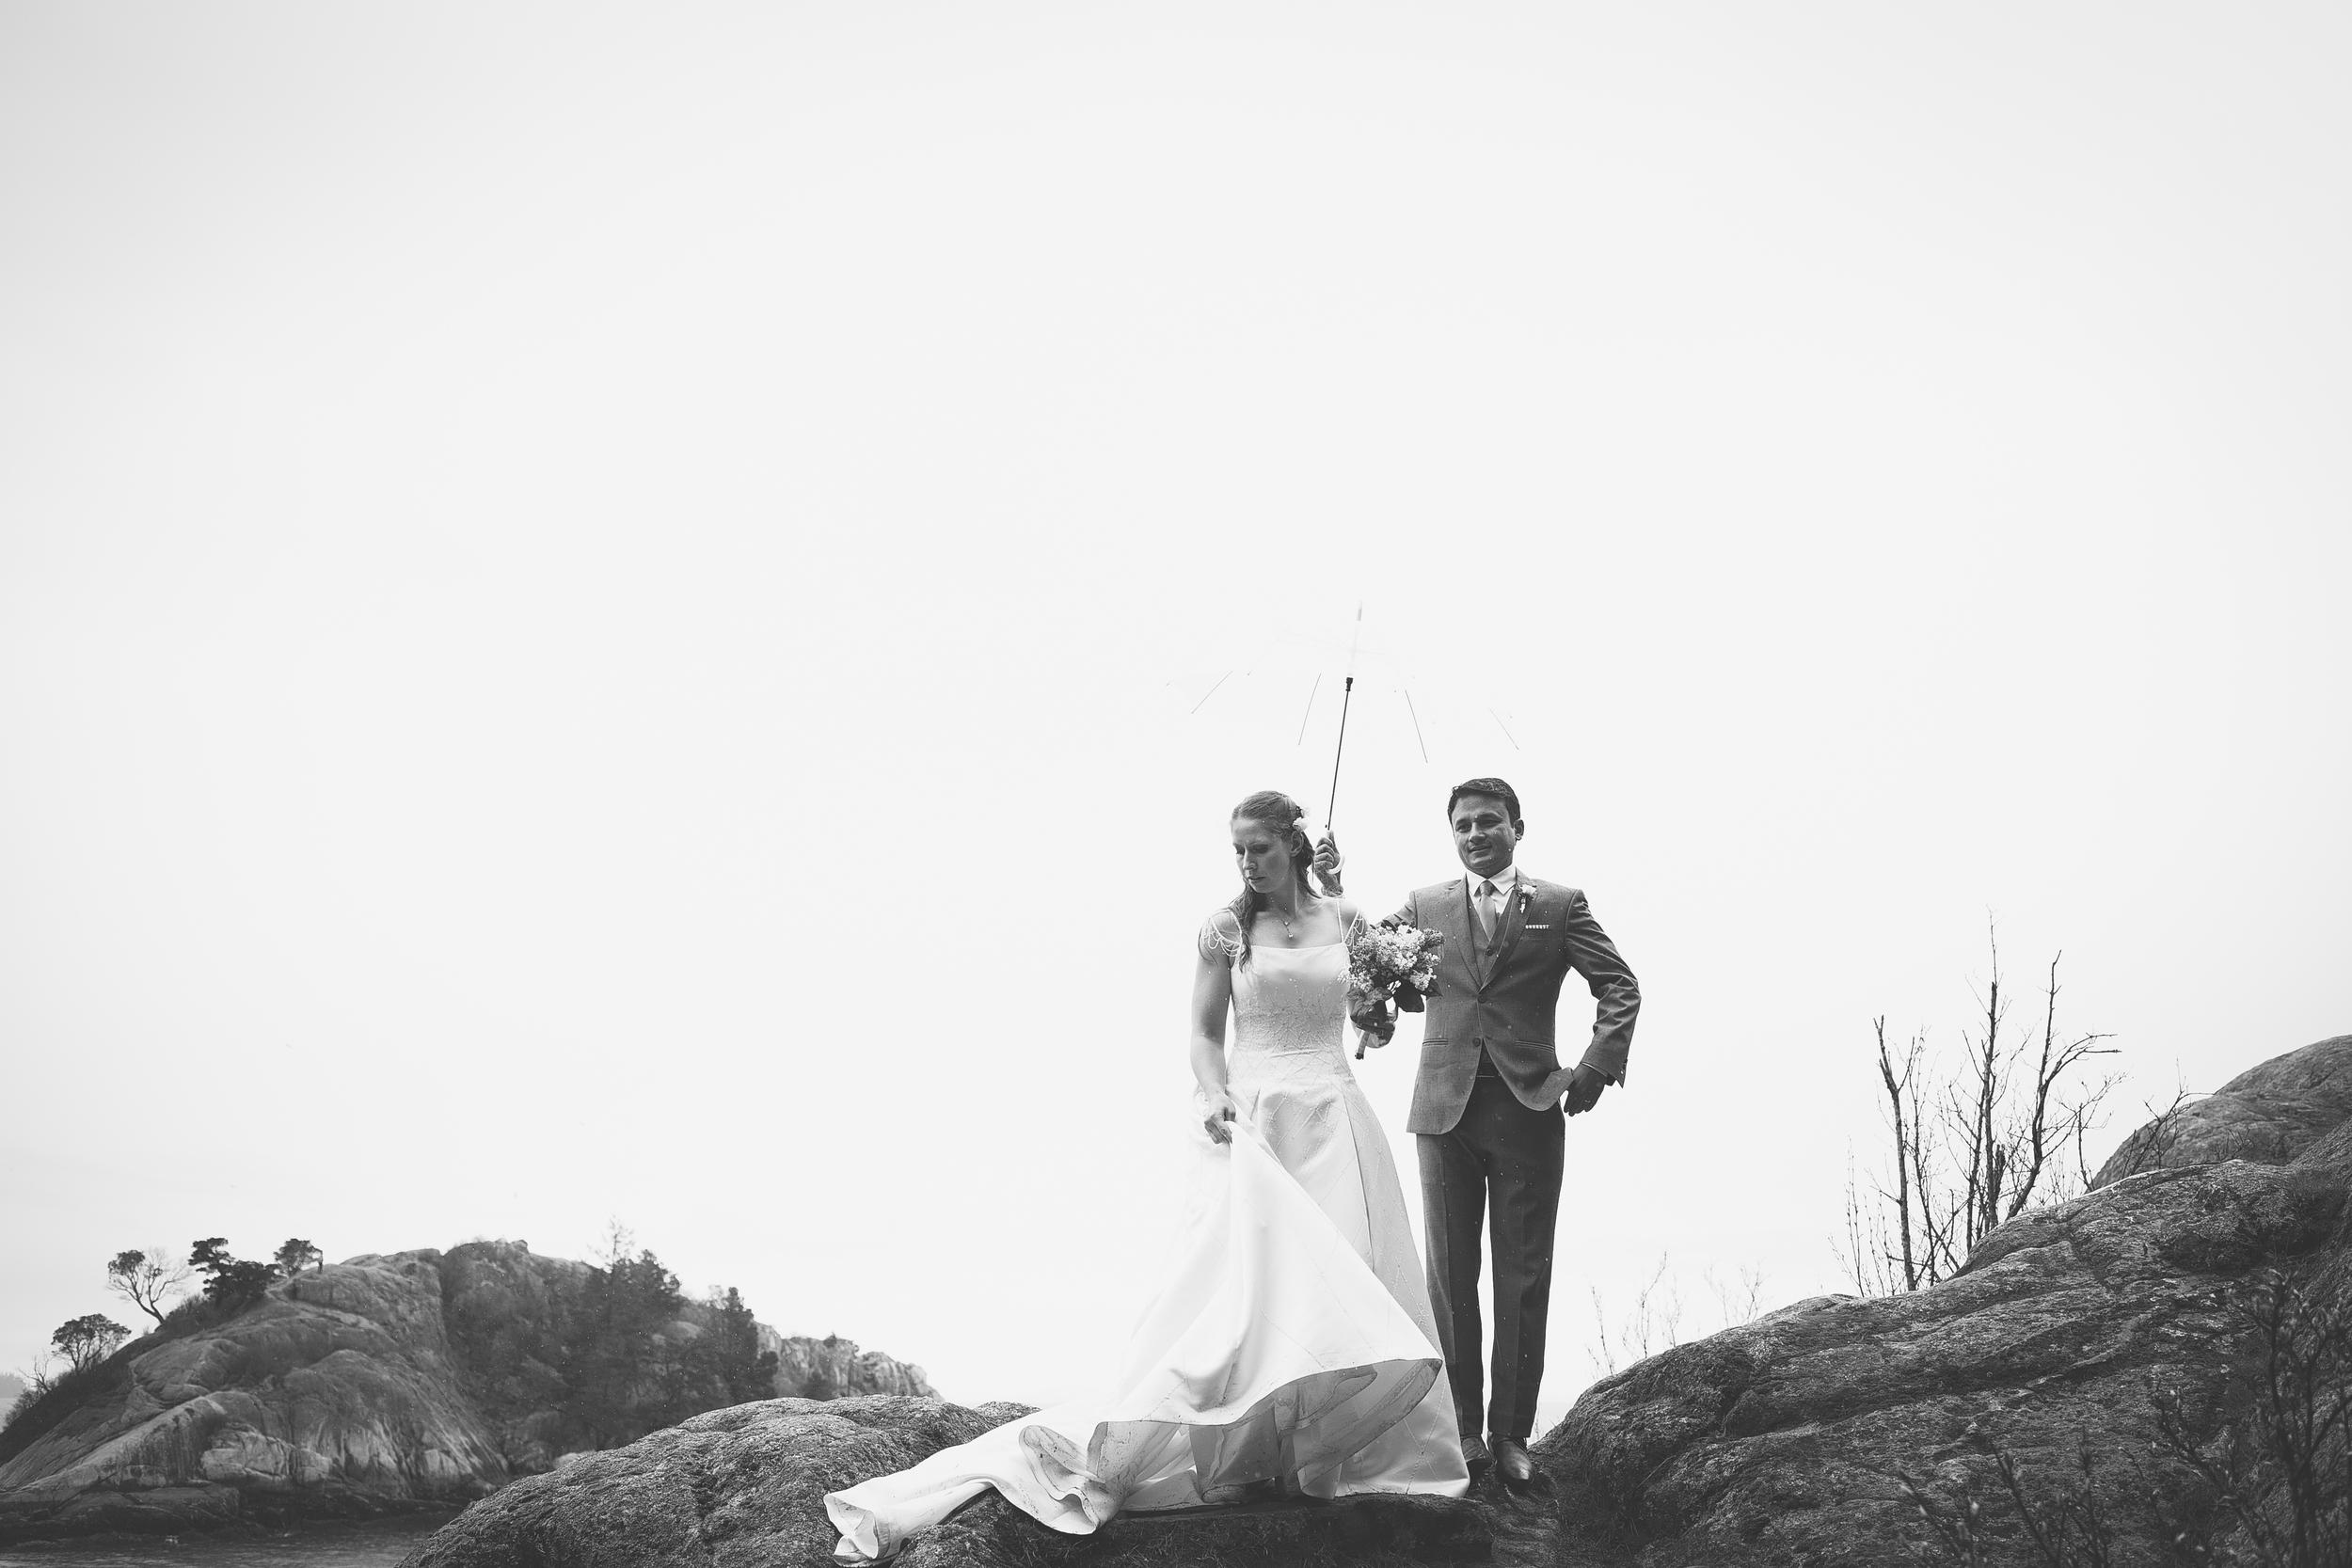 vancouver_photographer_wedding_DogwoodPhotography-17.jpg